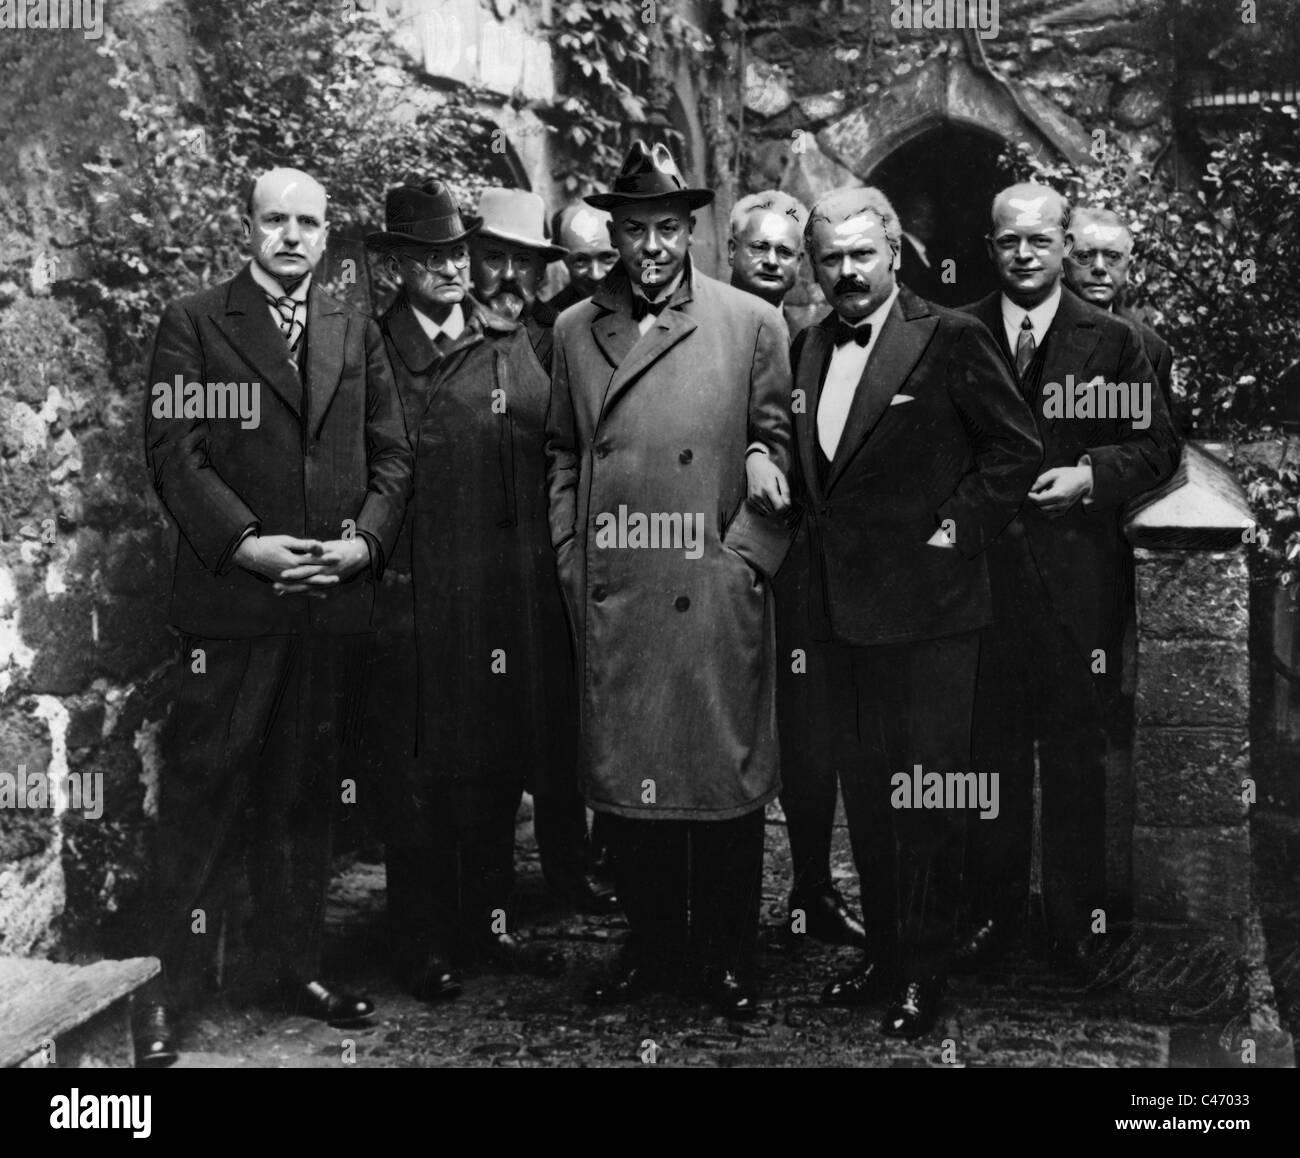 Freiherr von Muenchhausen Boerris Foto de stock